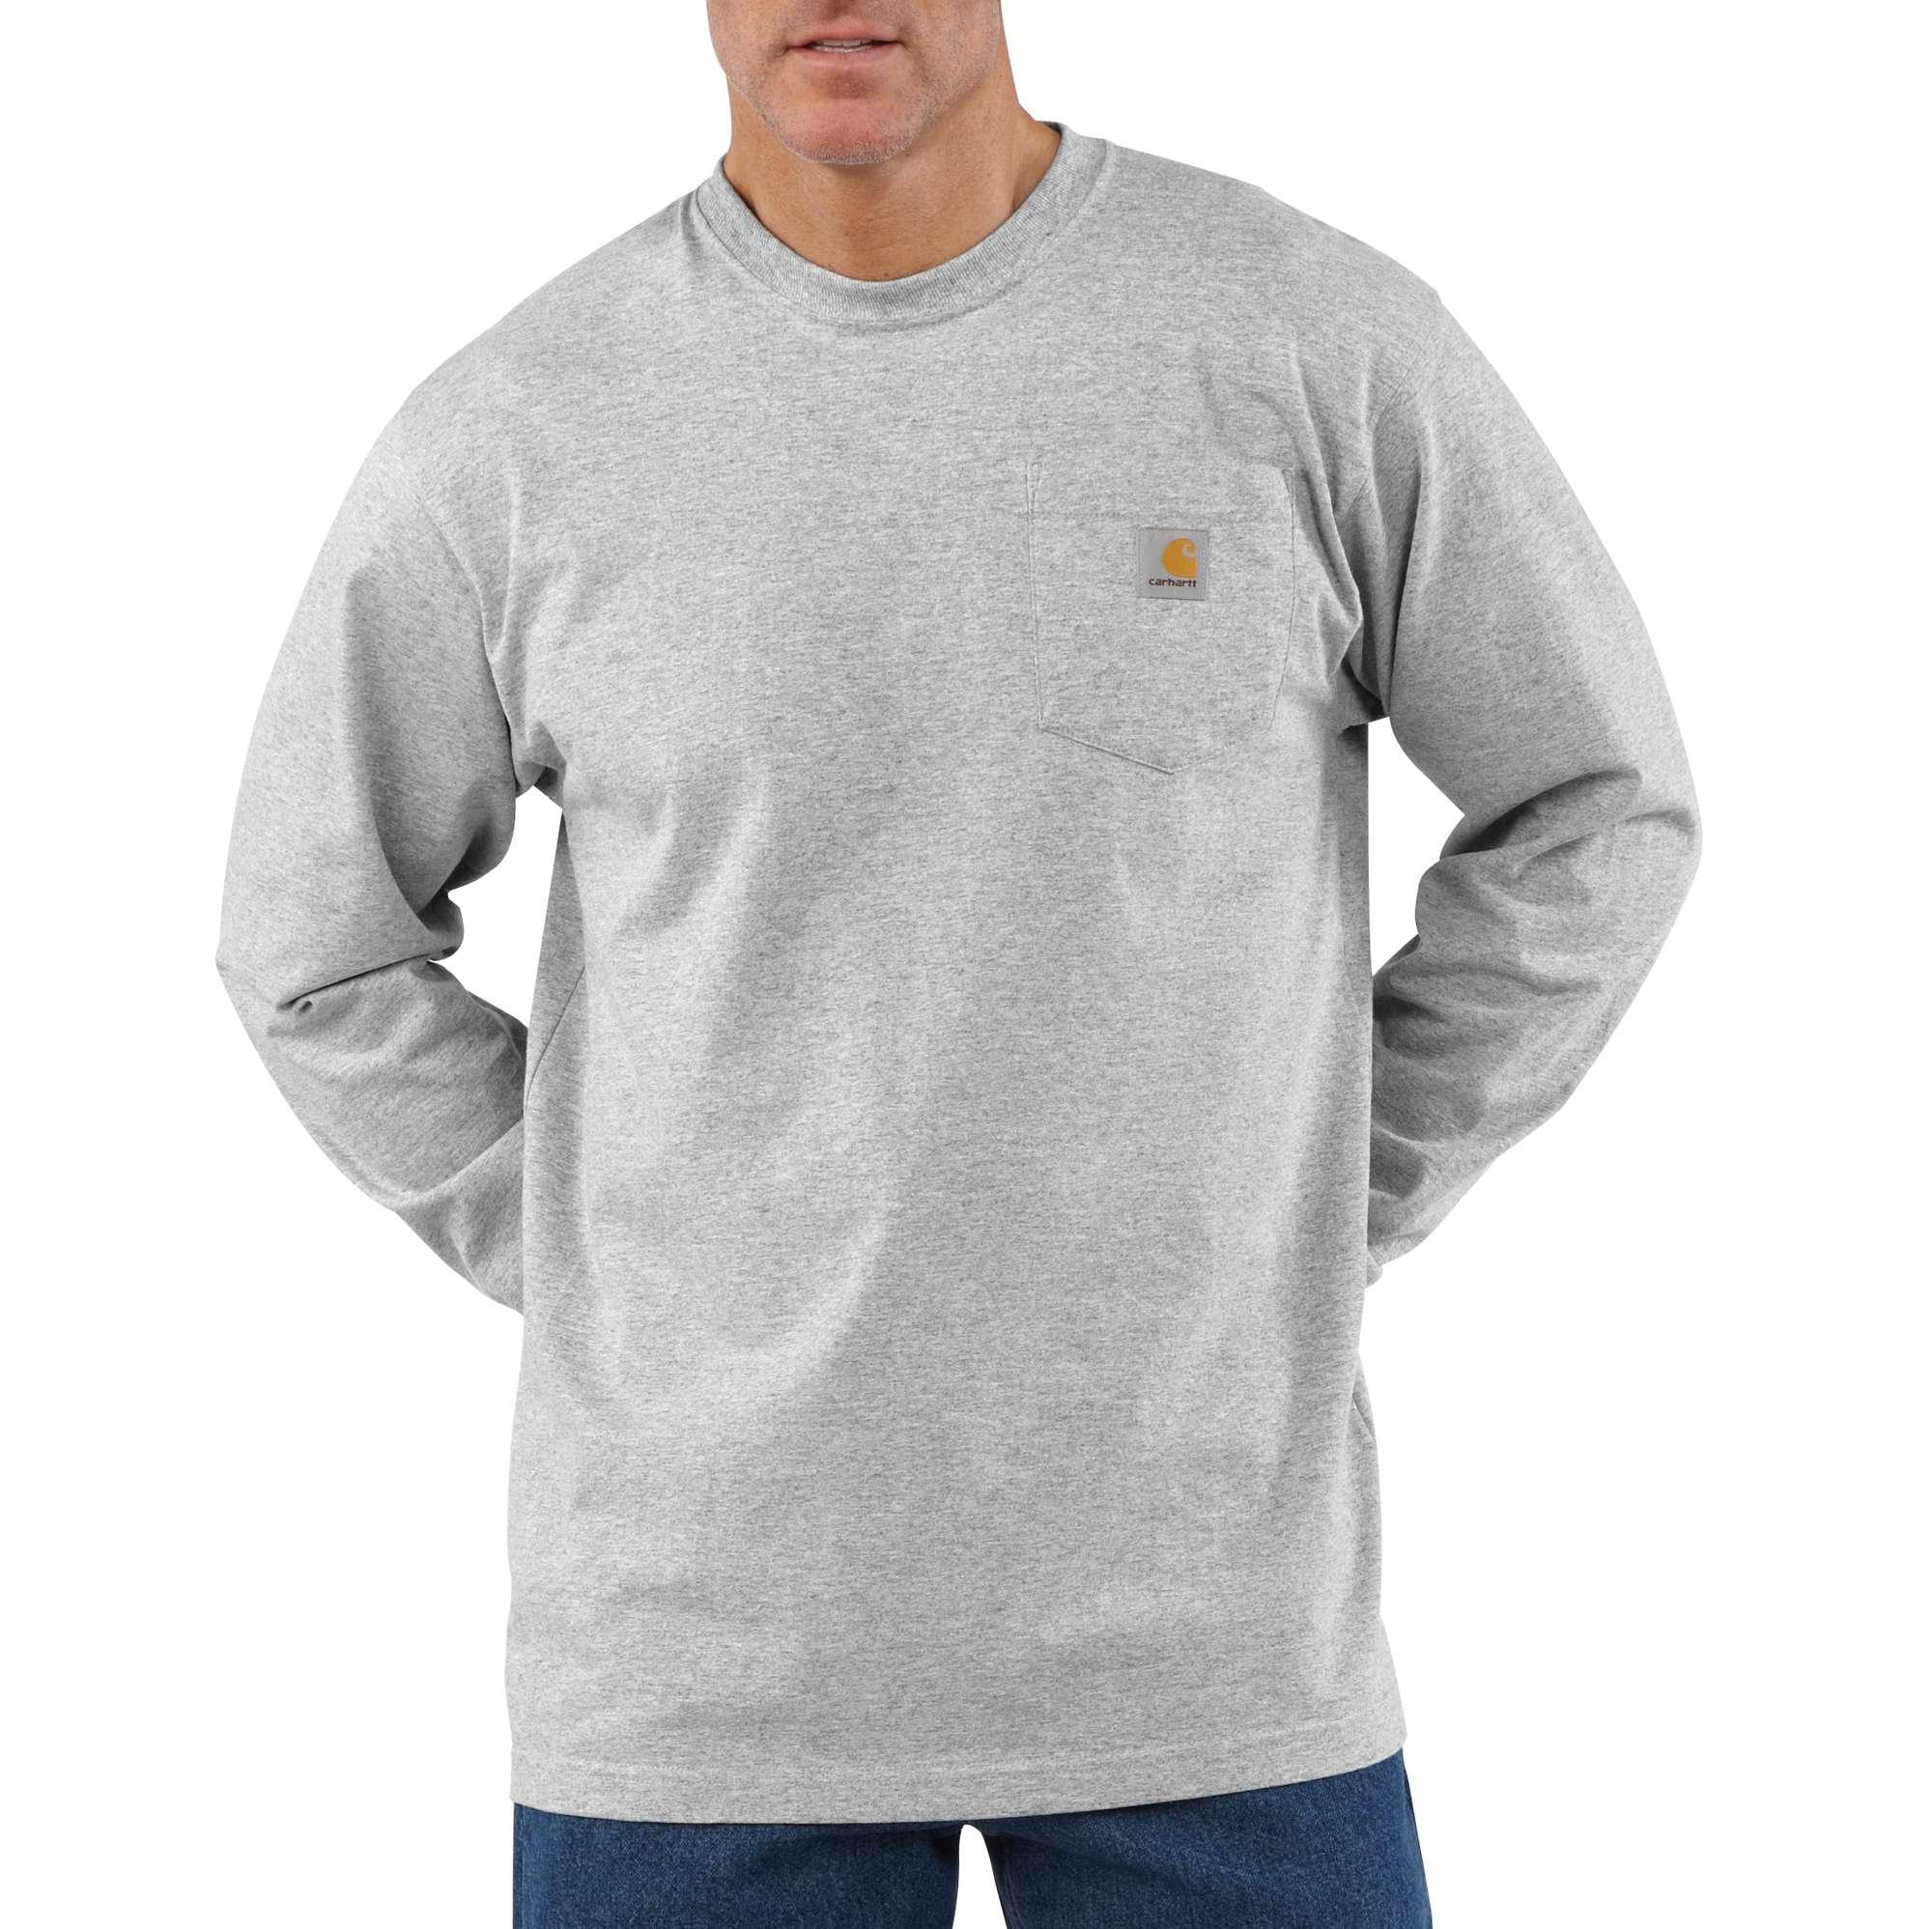 Men's Workwear Long Sleeve Pocket T-Shirt, Heather Gray, swatch